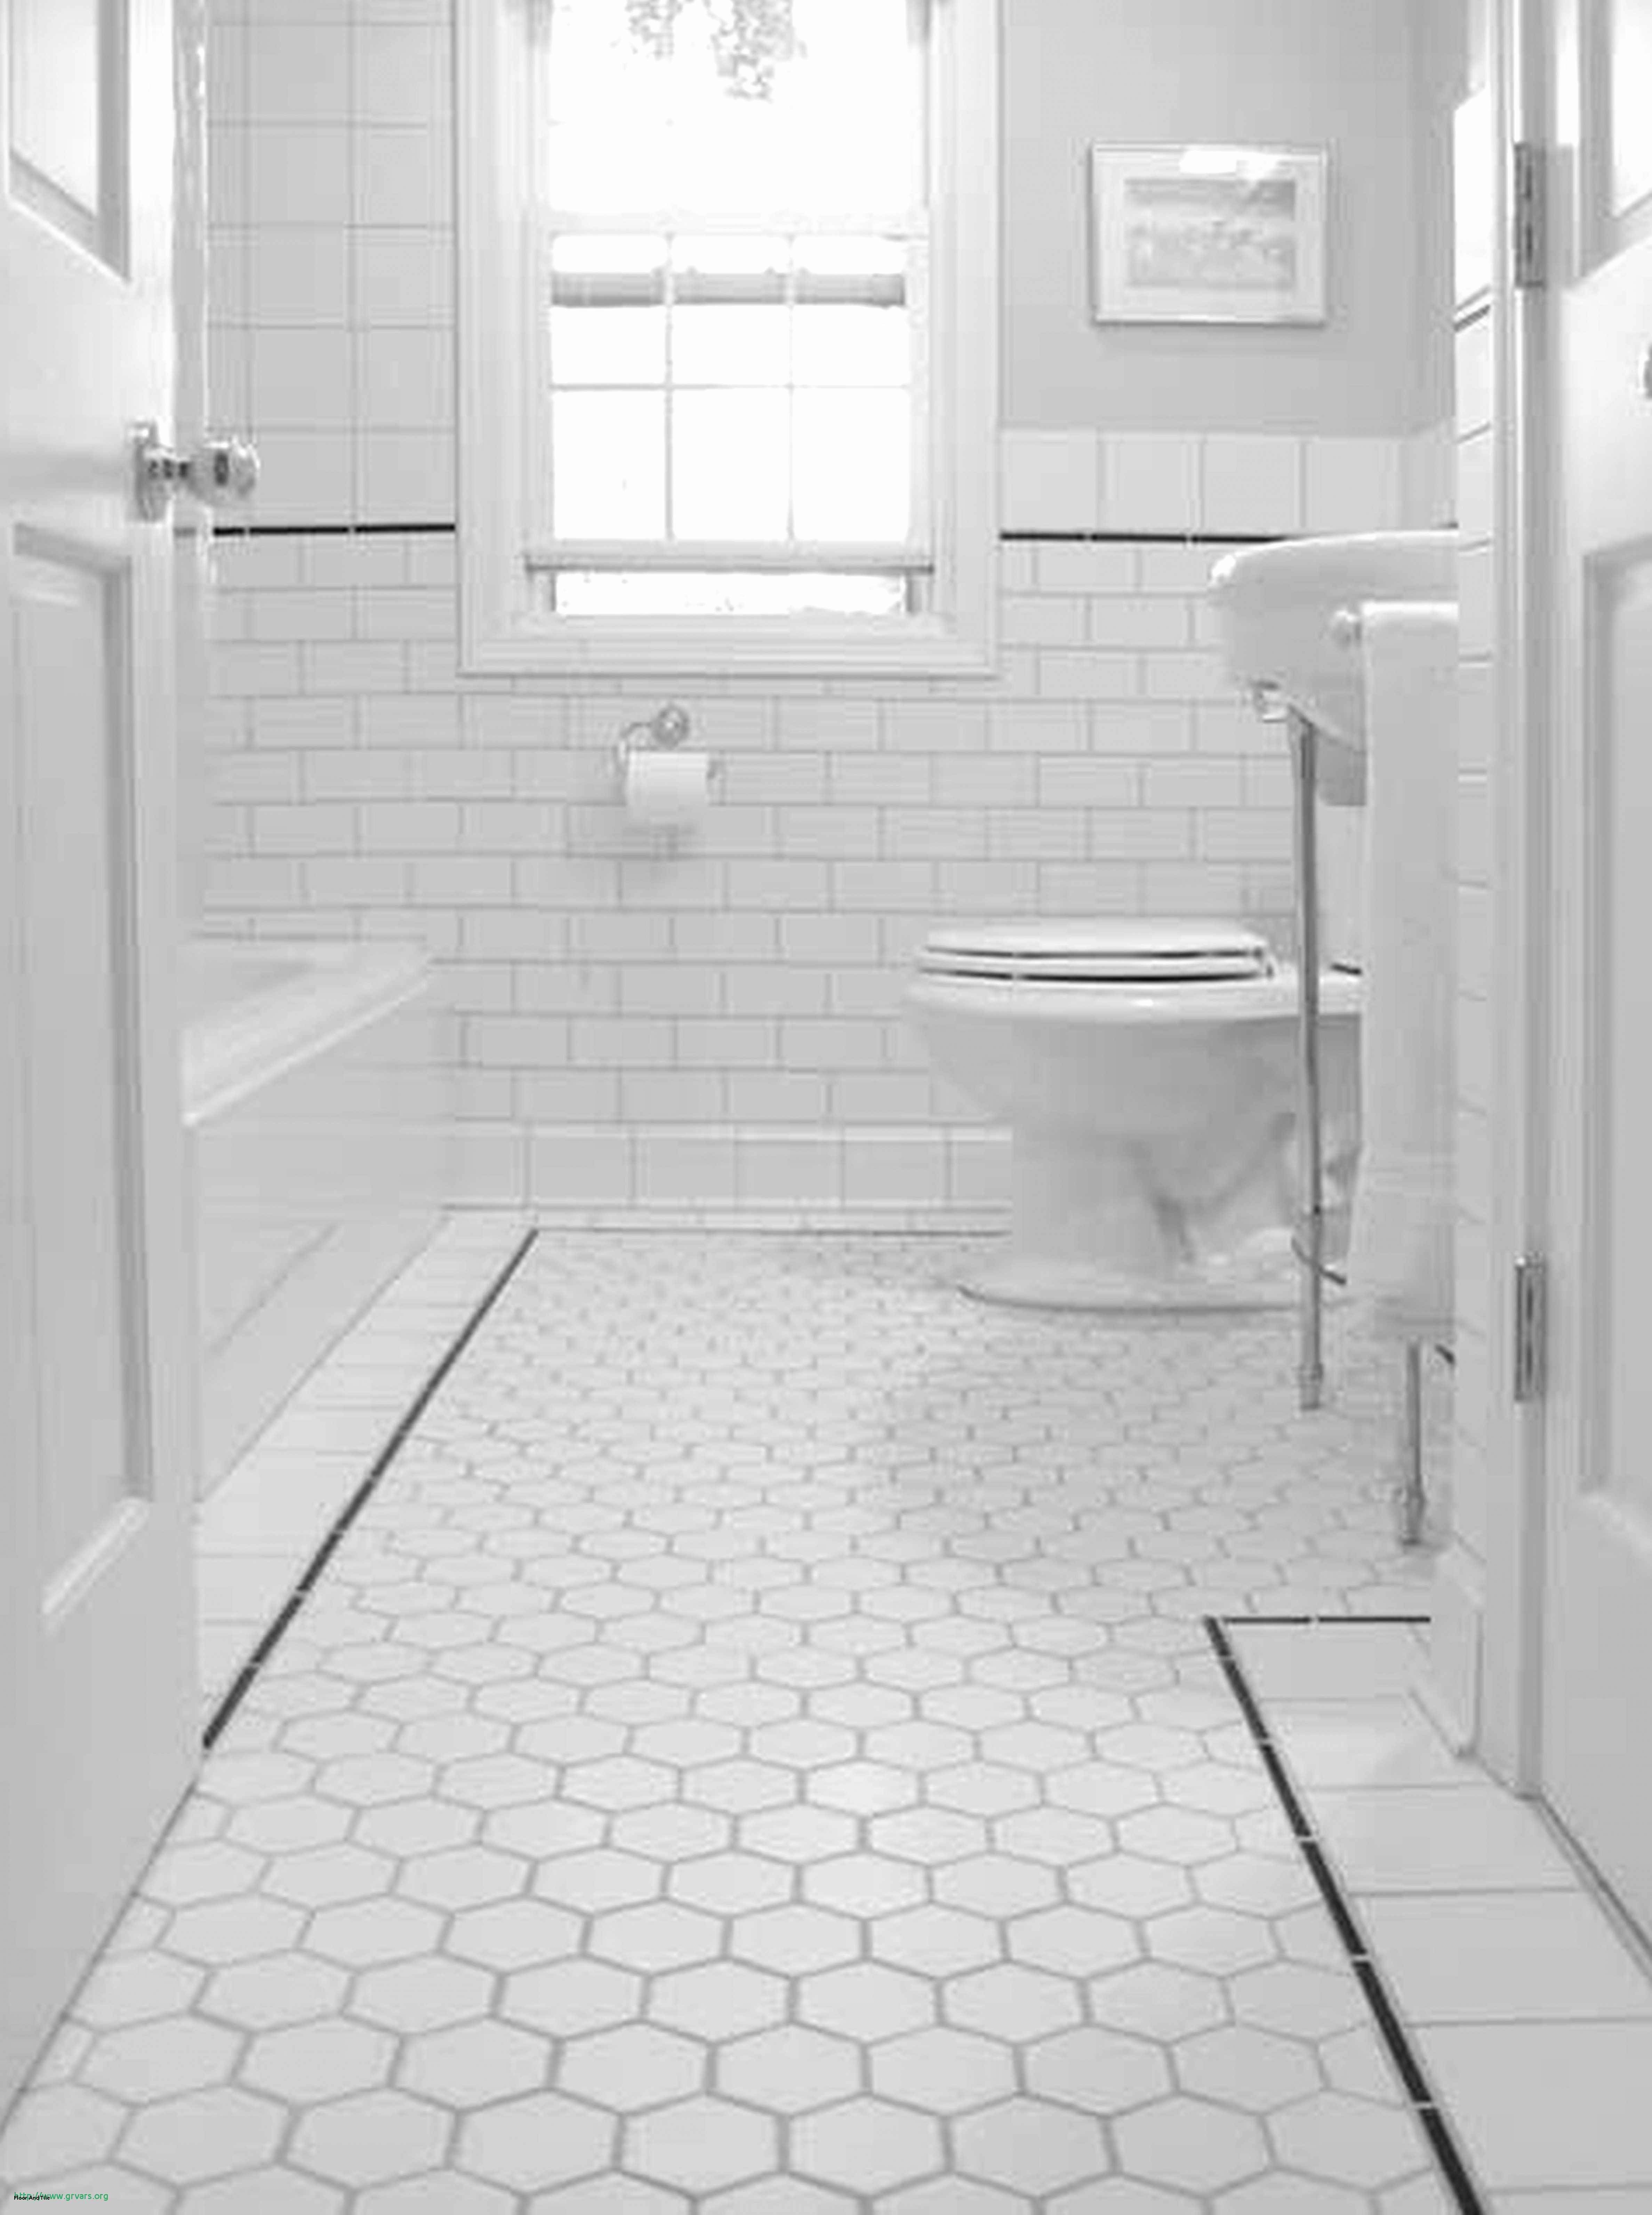 kitchen flooring ideas new inspirational kitchen floor tile designs kitchen flooring 0d stock of kitchen flooring ideas